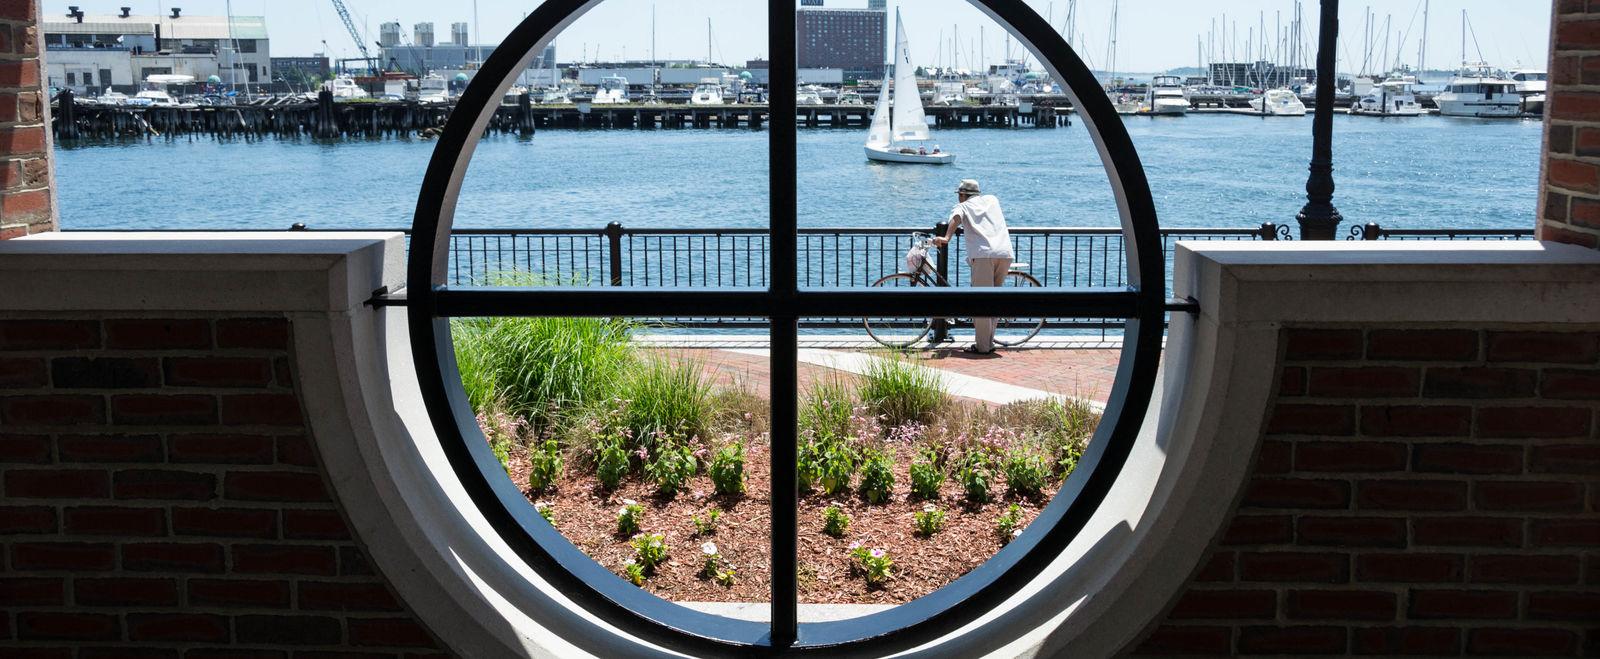 East Boston Waterfront